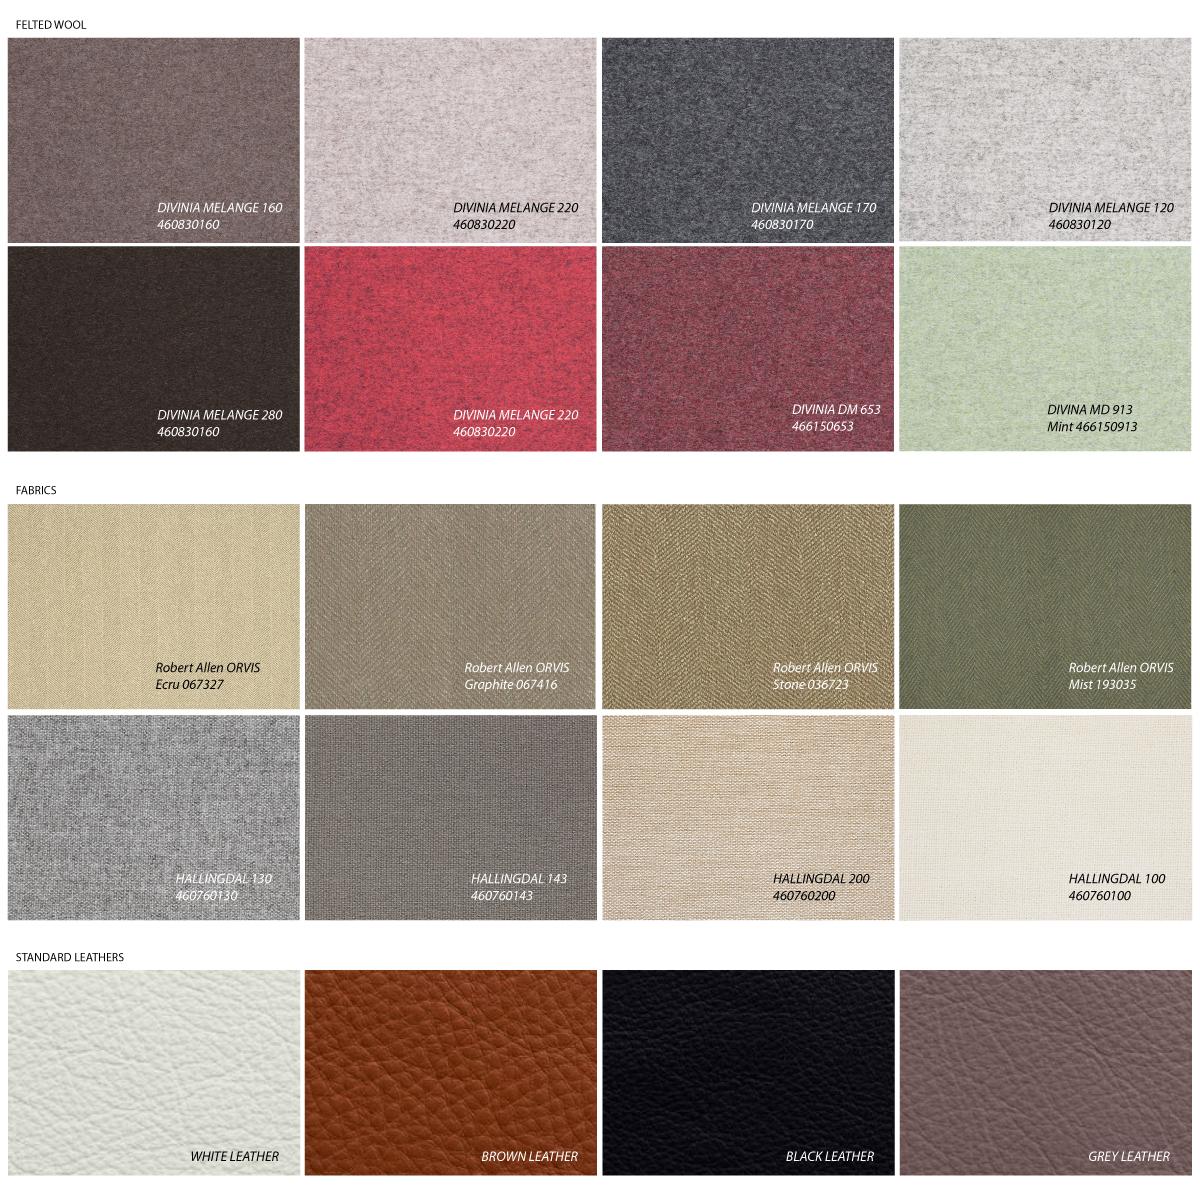 Standard Upholstery Options